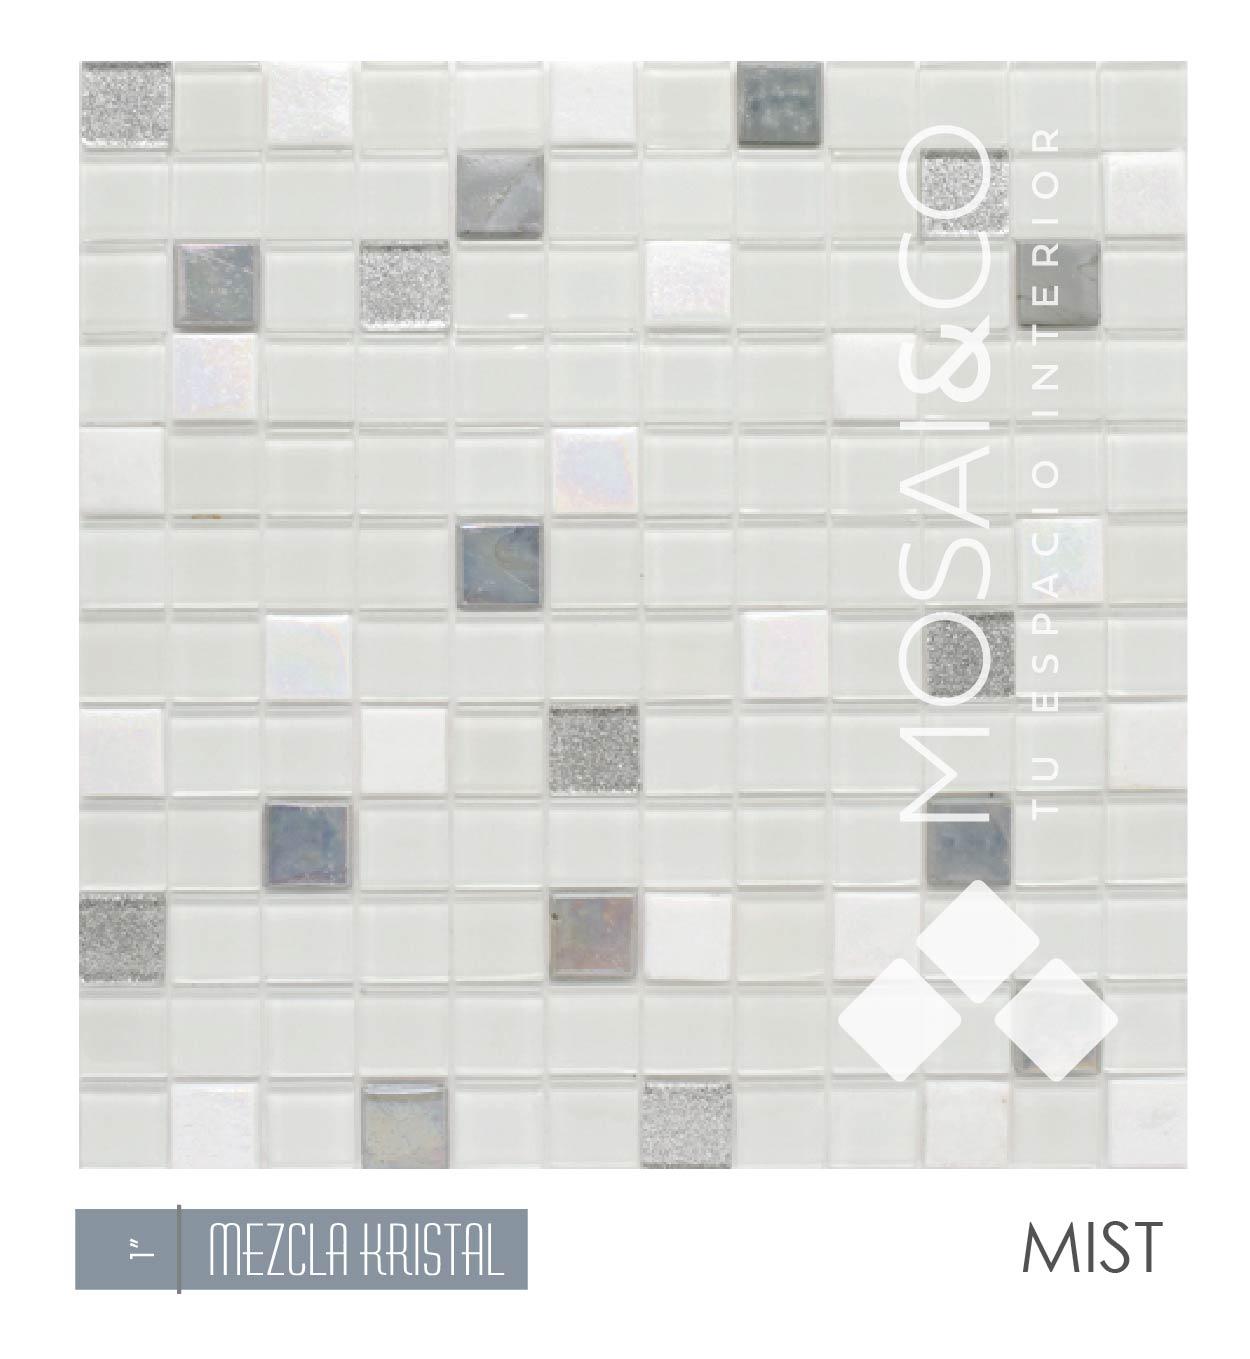 mosaico-linea-mezcla-kristal-mosaiandco-1-mist